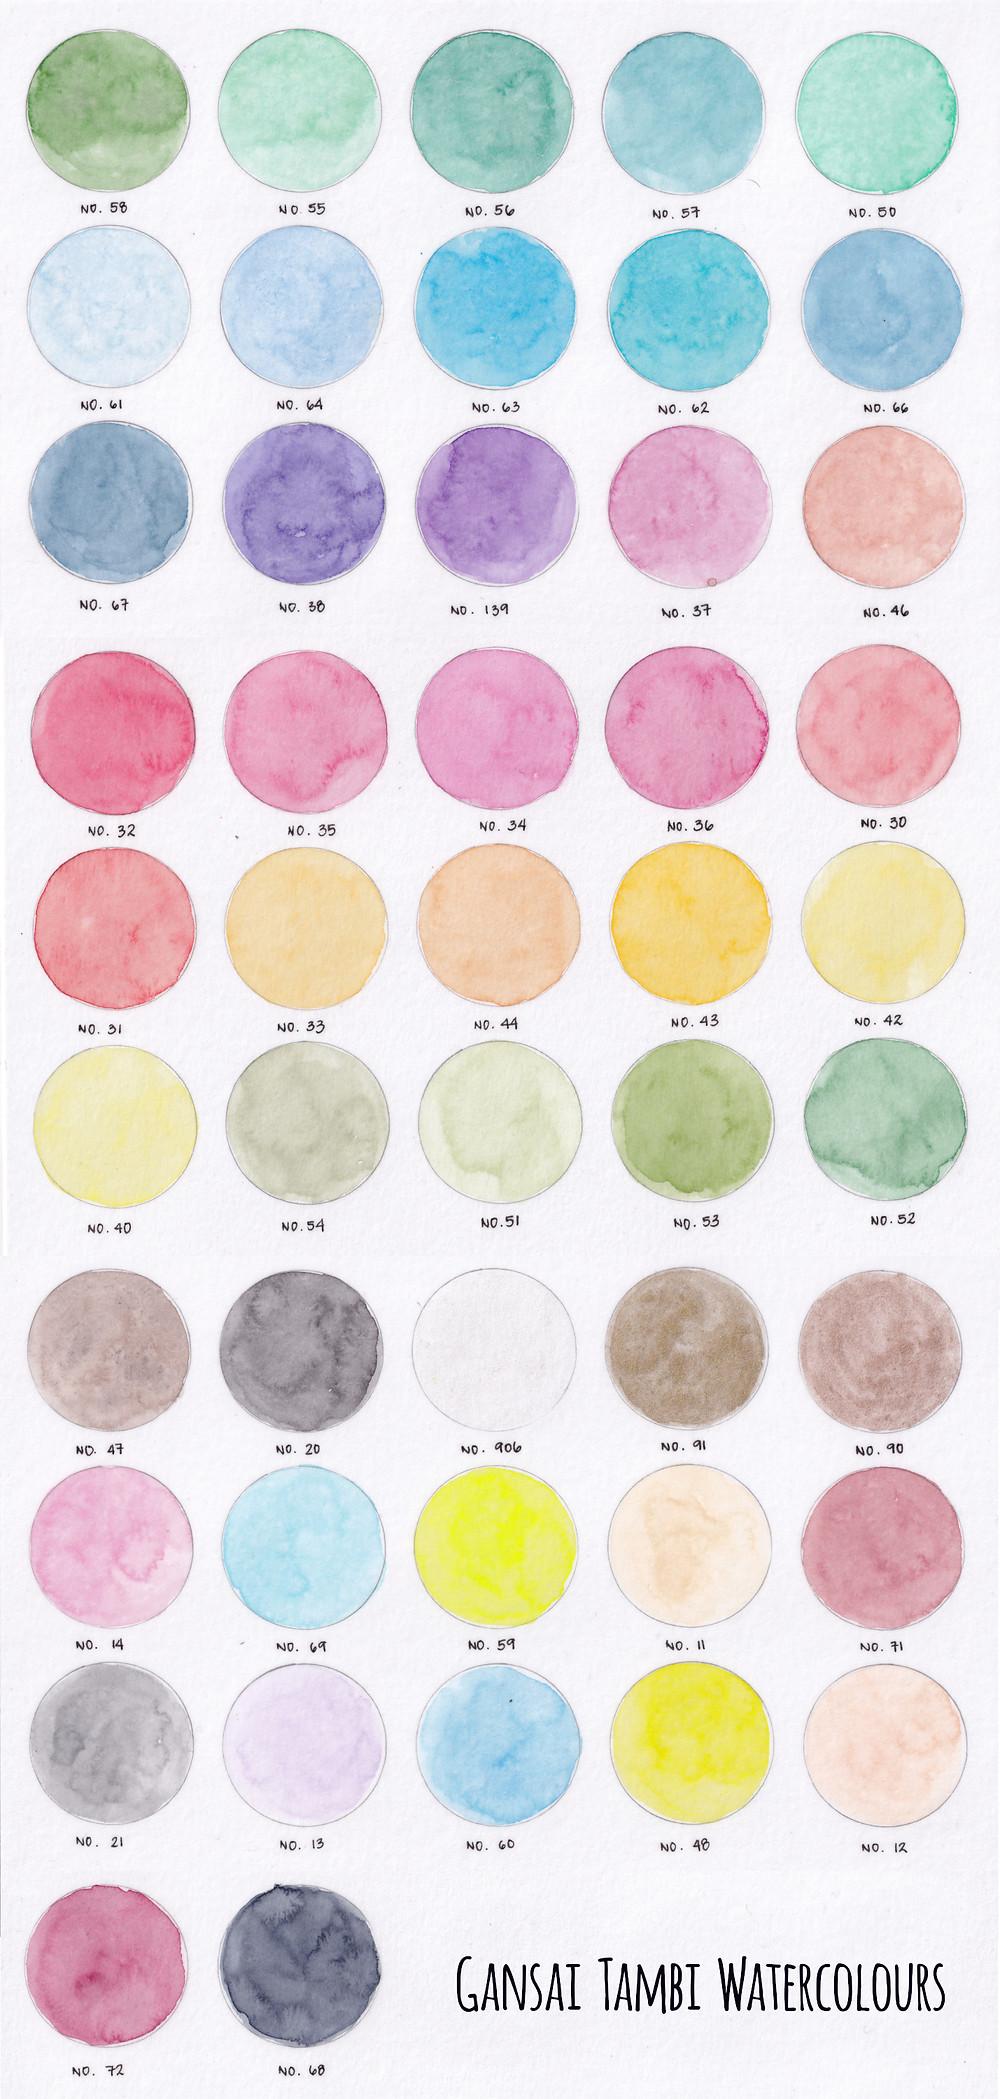 48 Set Gansai Tambi Watercolours swatch light wash